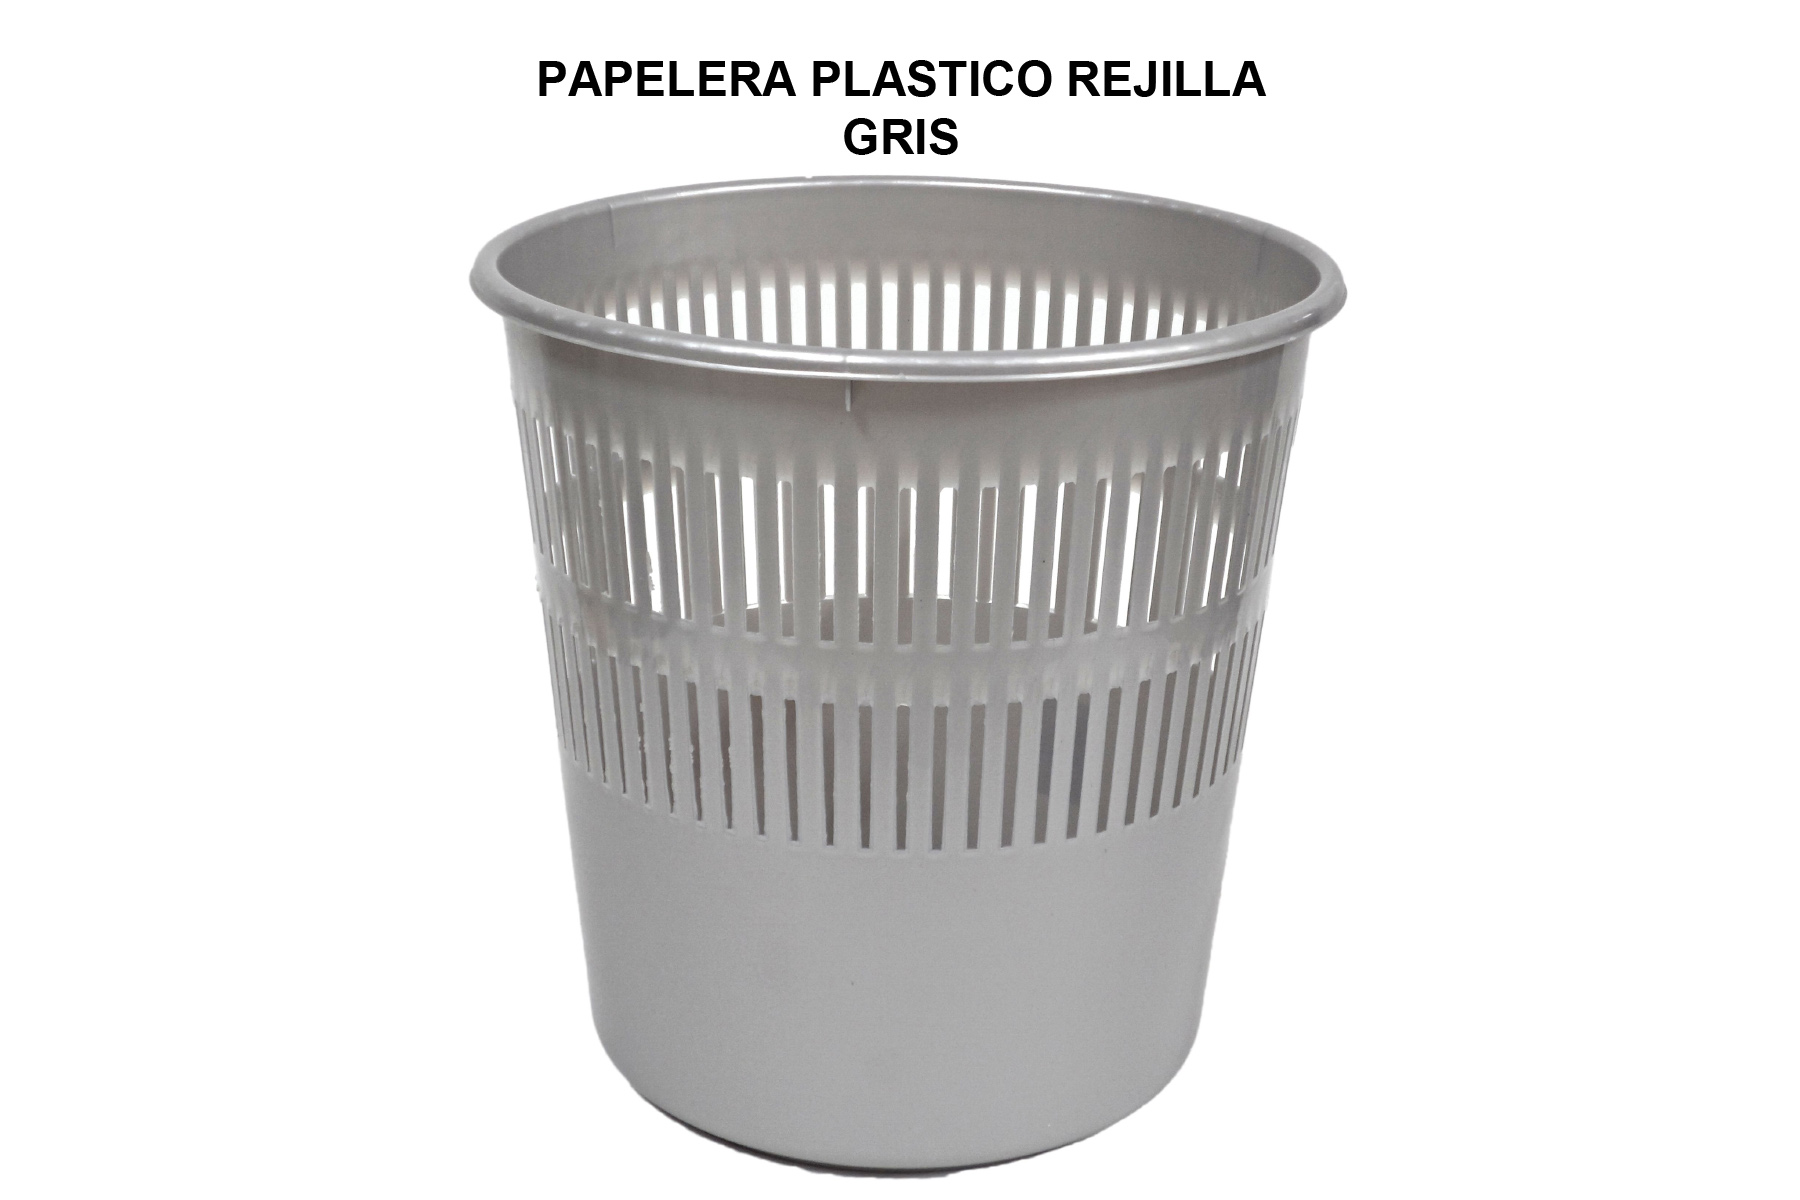 PAPELERA PLASTICO REJILLA GRIS